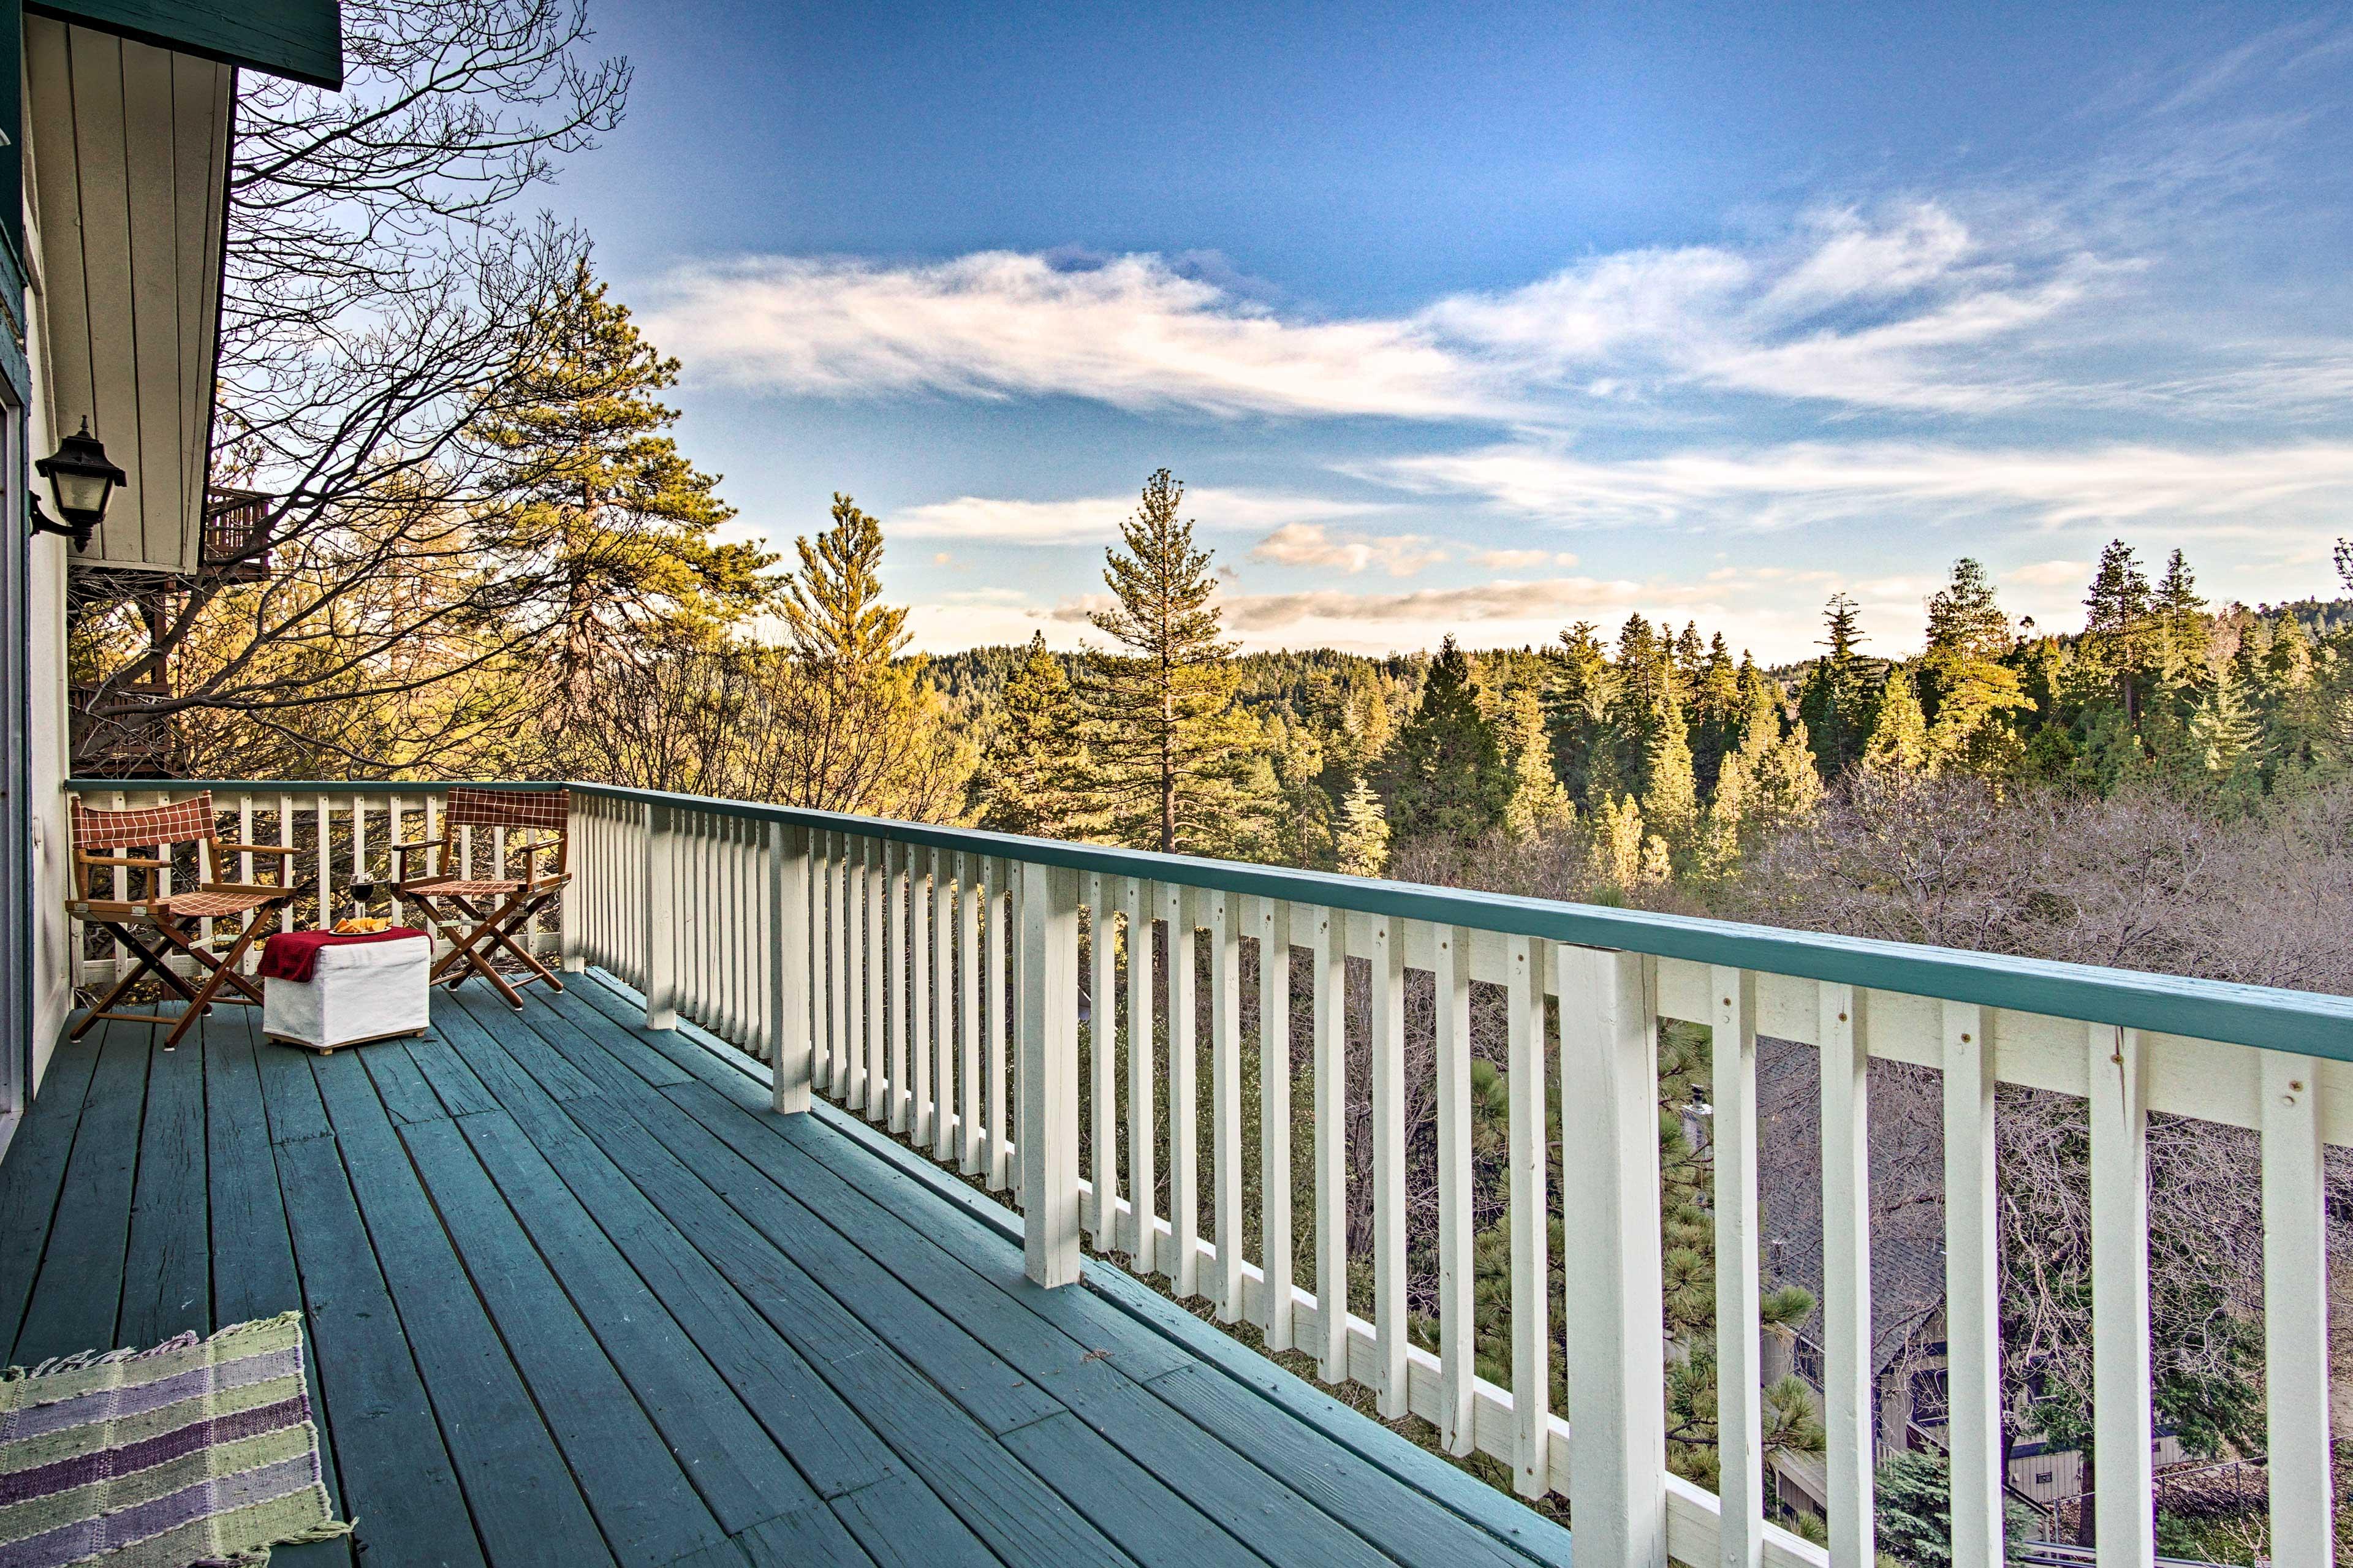 Enjoy the scenic treeline views from one of 2 balconies.